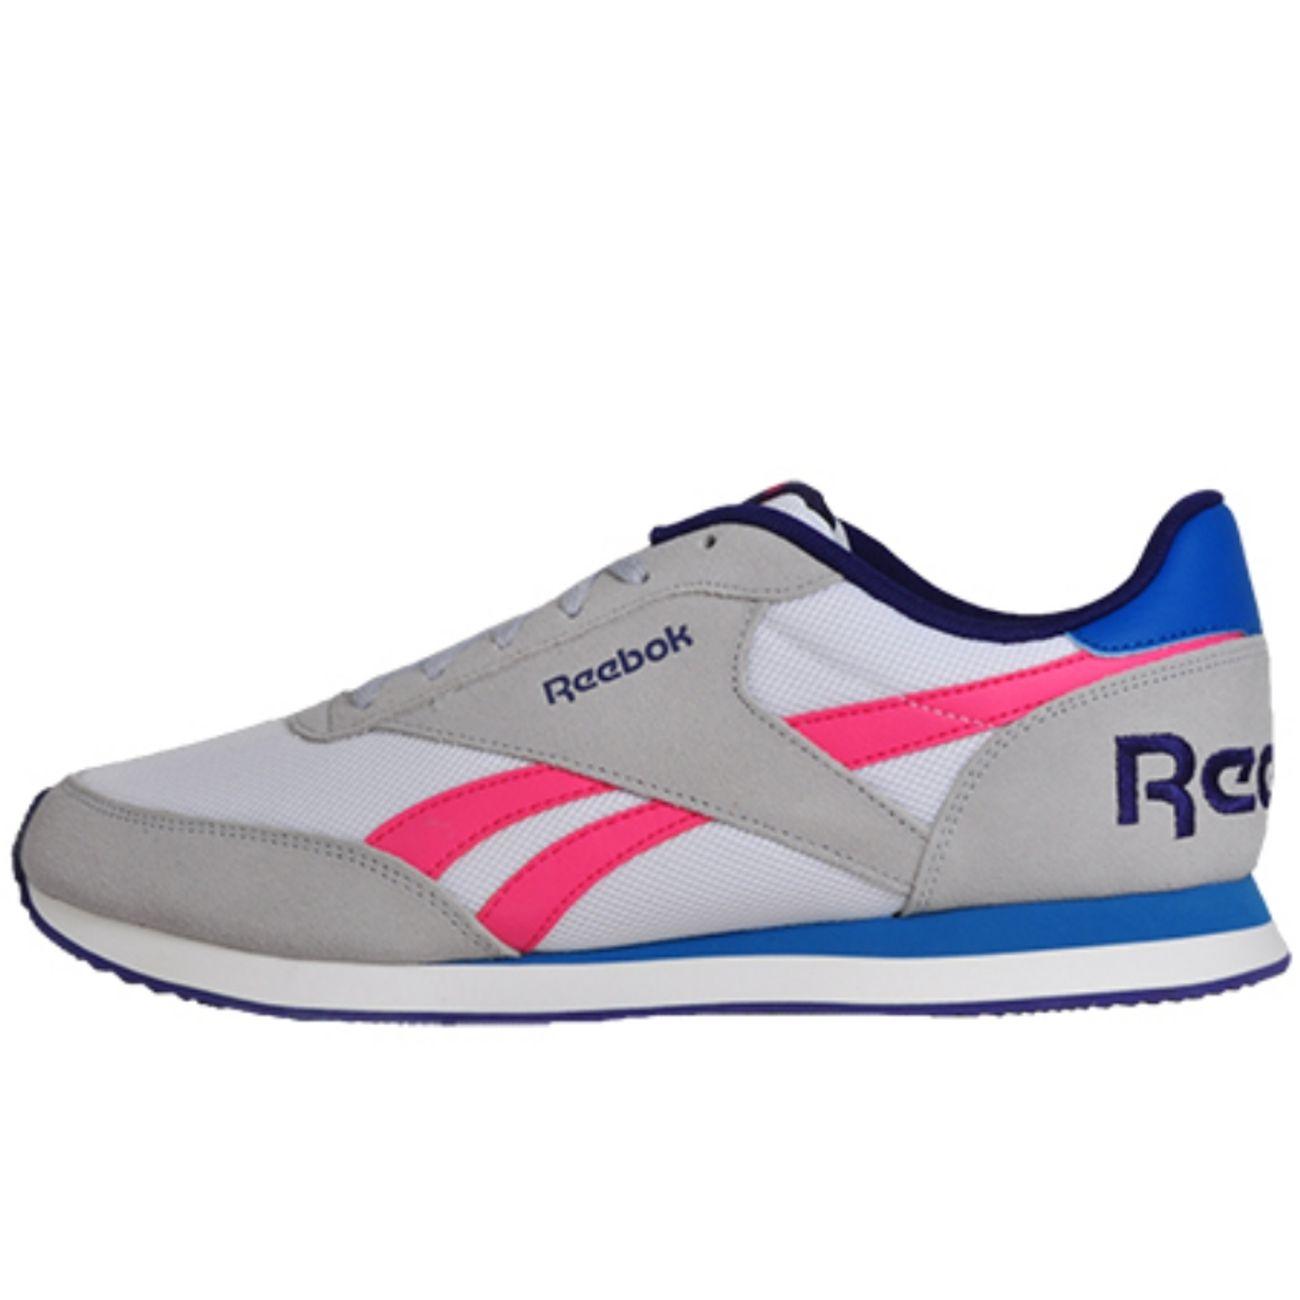 Reebok Royal Classic Jogger 2Rs Baskets De Sport Fitness Gym